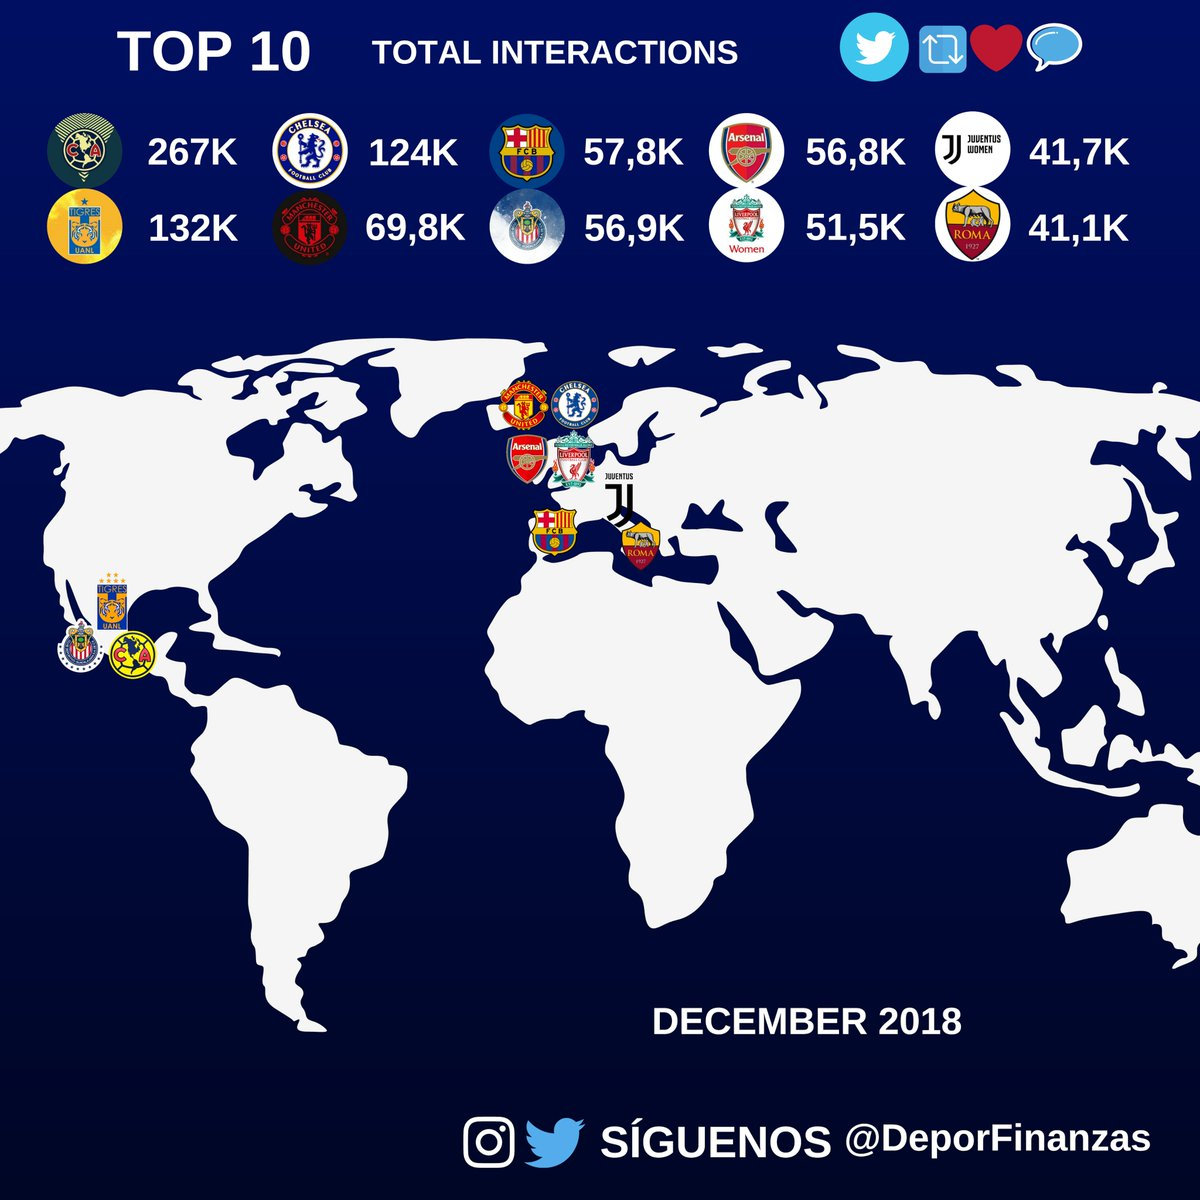 📲⚽ TOP 10 women´s football clubs ranked by total interactions on #twitter during december 2018!  🔁💙💬    1.@AmericaFemenil  2.@TigresFemenil  3.@ChelseaFCW  4.@ManUtdWomen  5.@FCBfemeni  6.@ChivasFemenil  7.@ArsenalWFC  8.@LiverpoolFCW  9.@JuventusFCWomen  10.@ASRomaWomen